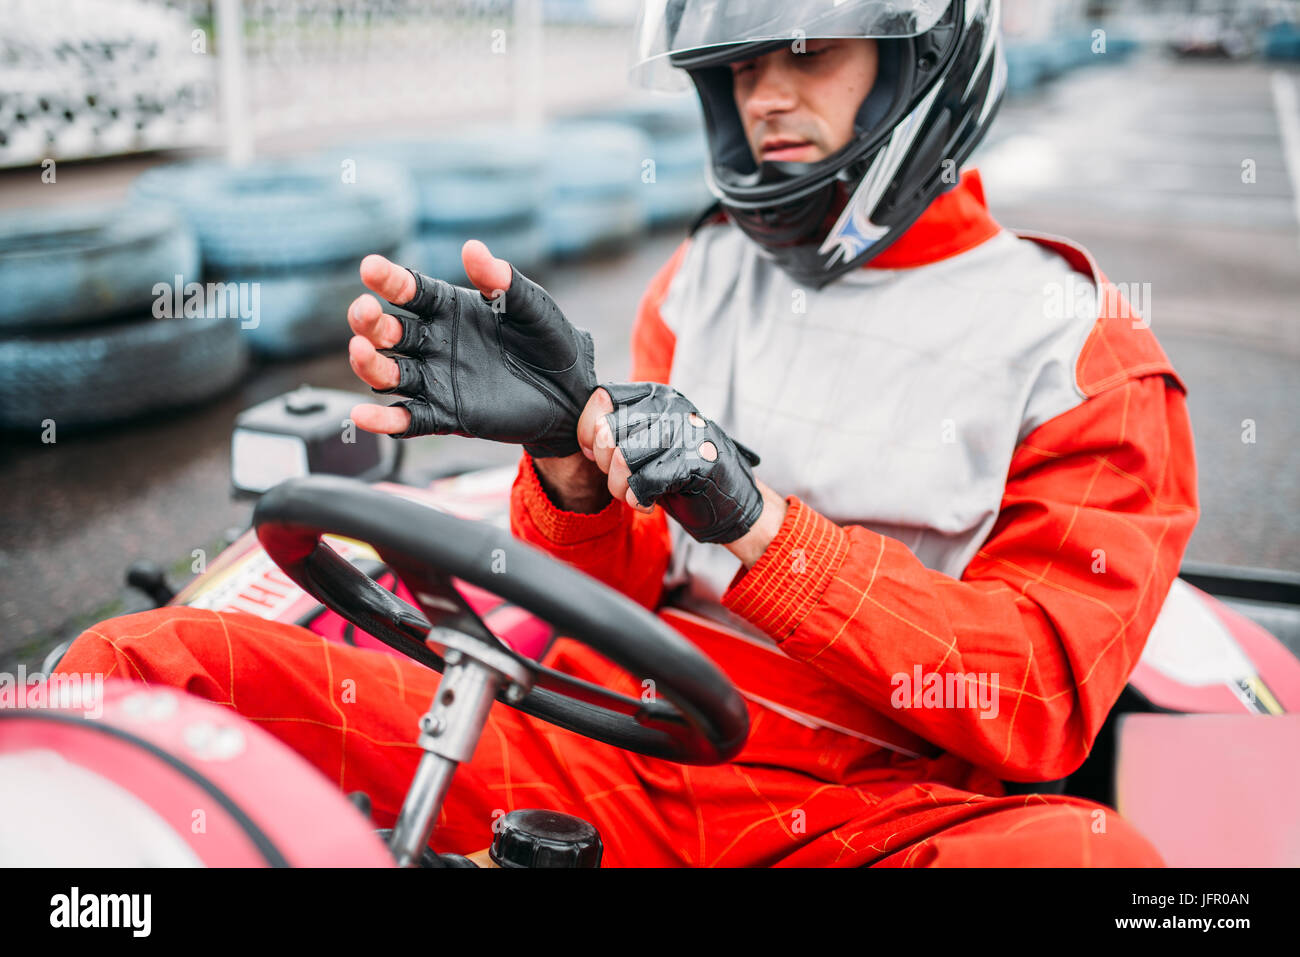 Go Kart Engine Stock Photos & Go Kart Engine Stock Images